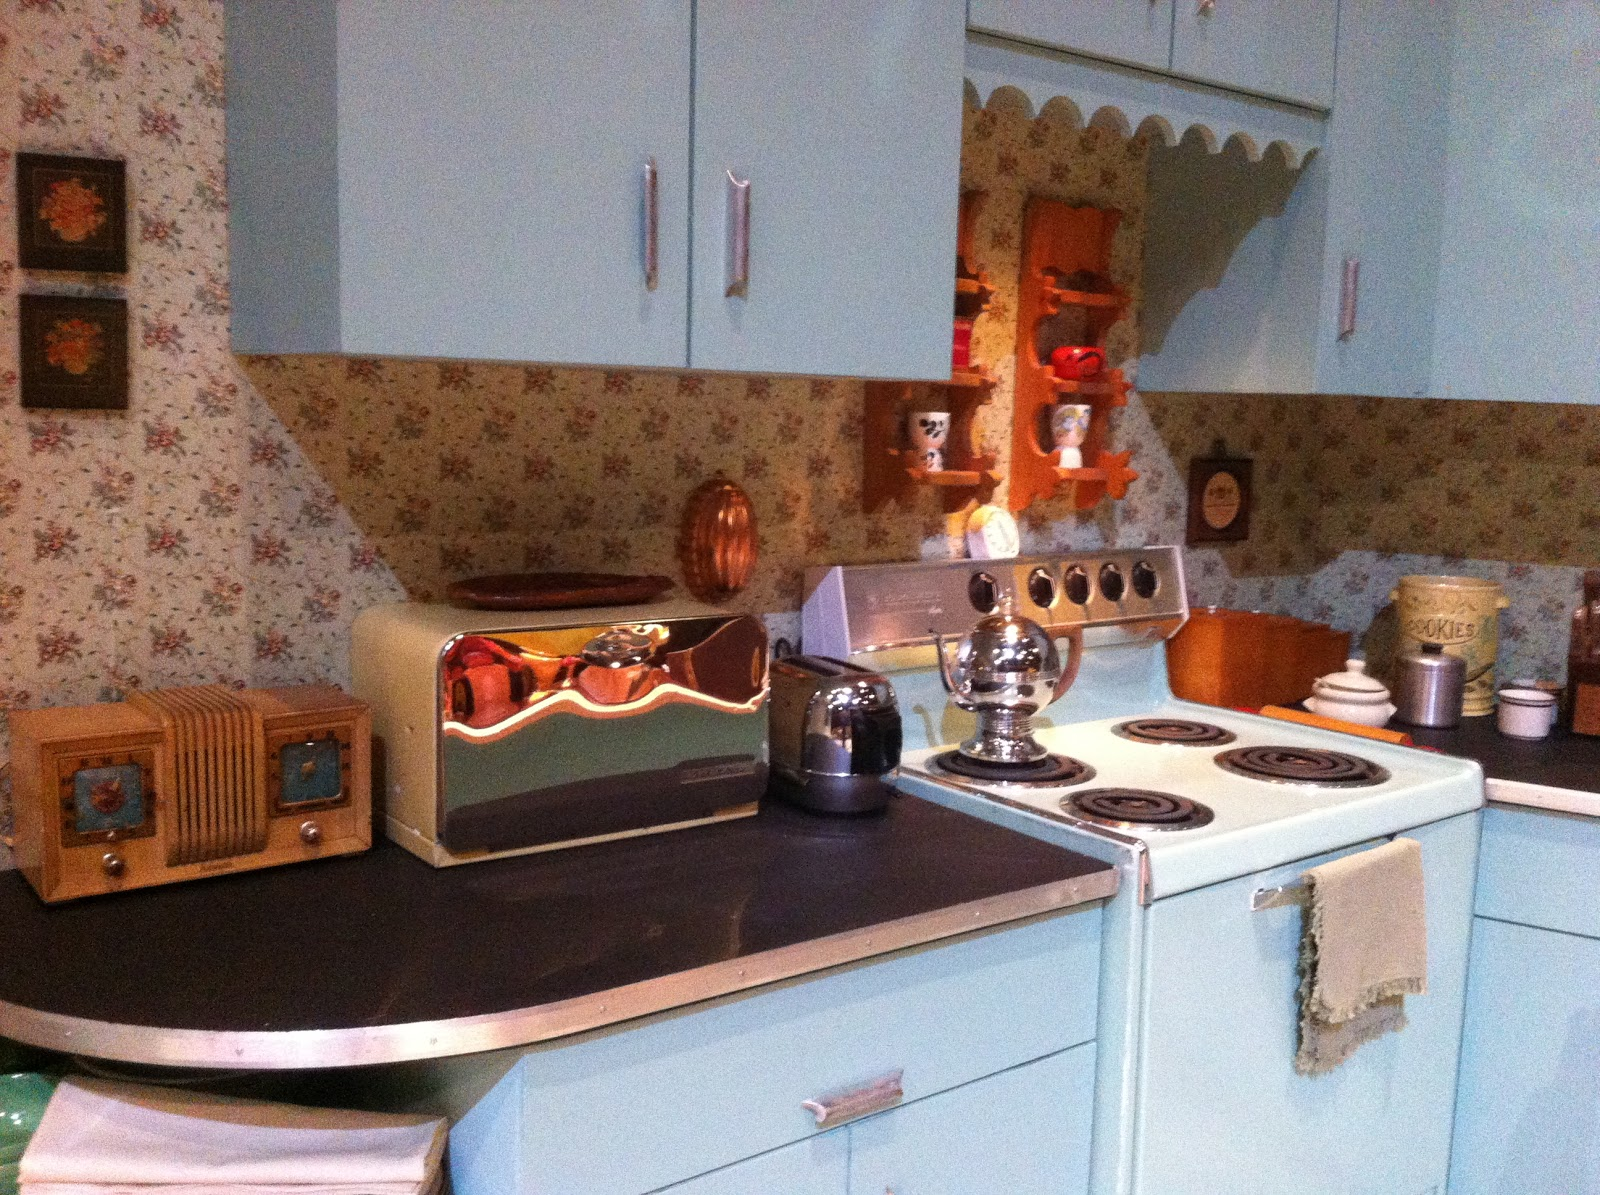 2013 best picz: Nineteen 1950s Wallpaper Designs - Fifties Kitchens